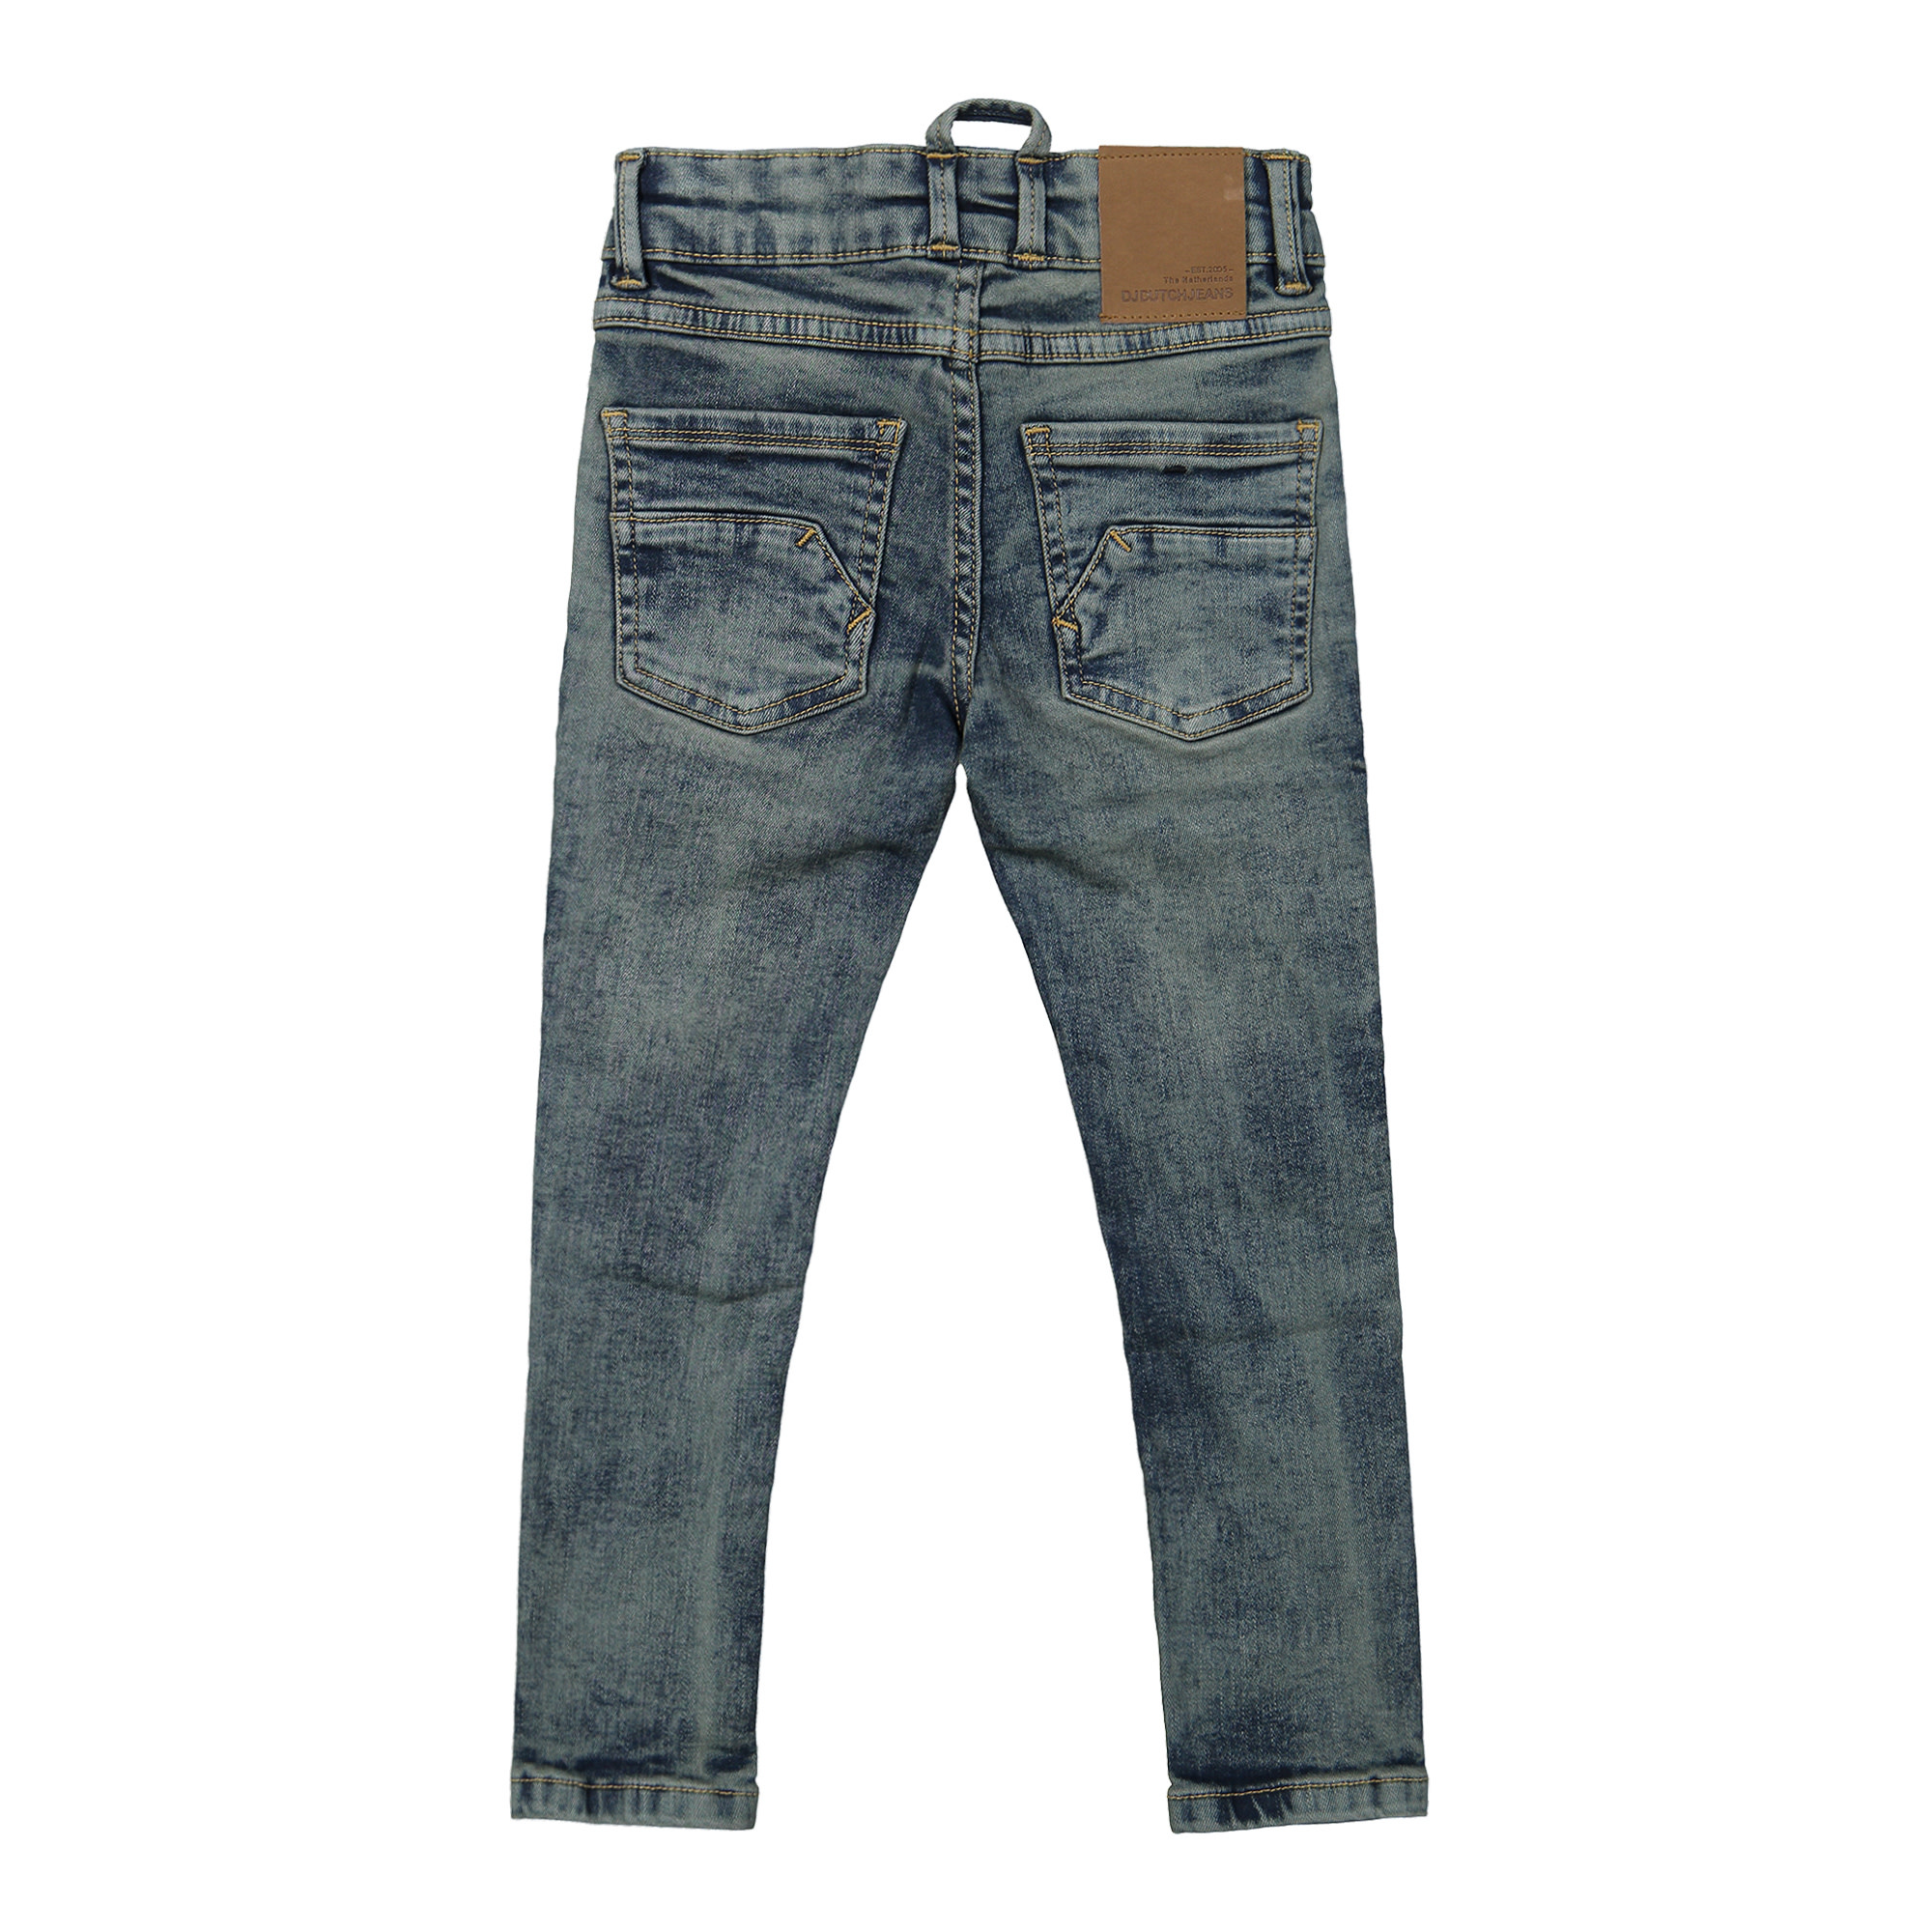 Boys Acid Wash Jeans